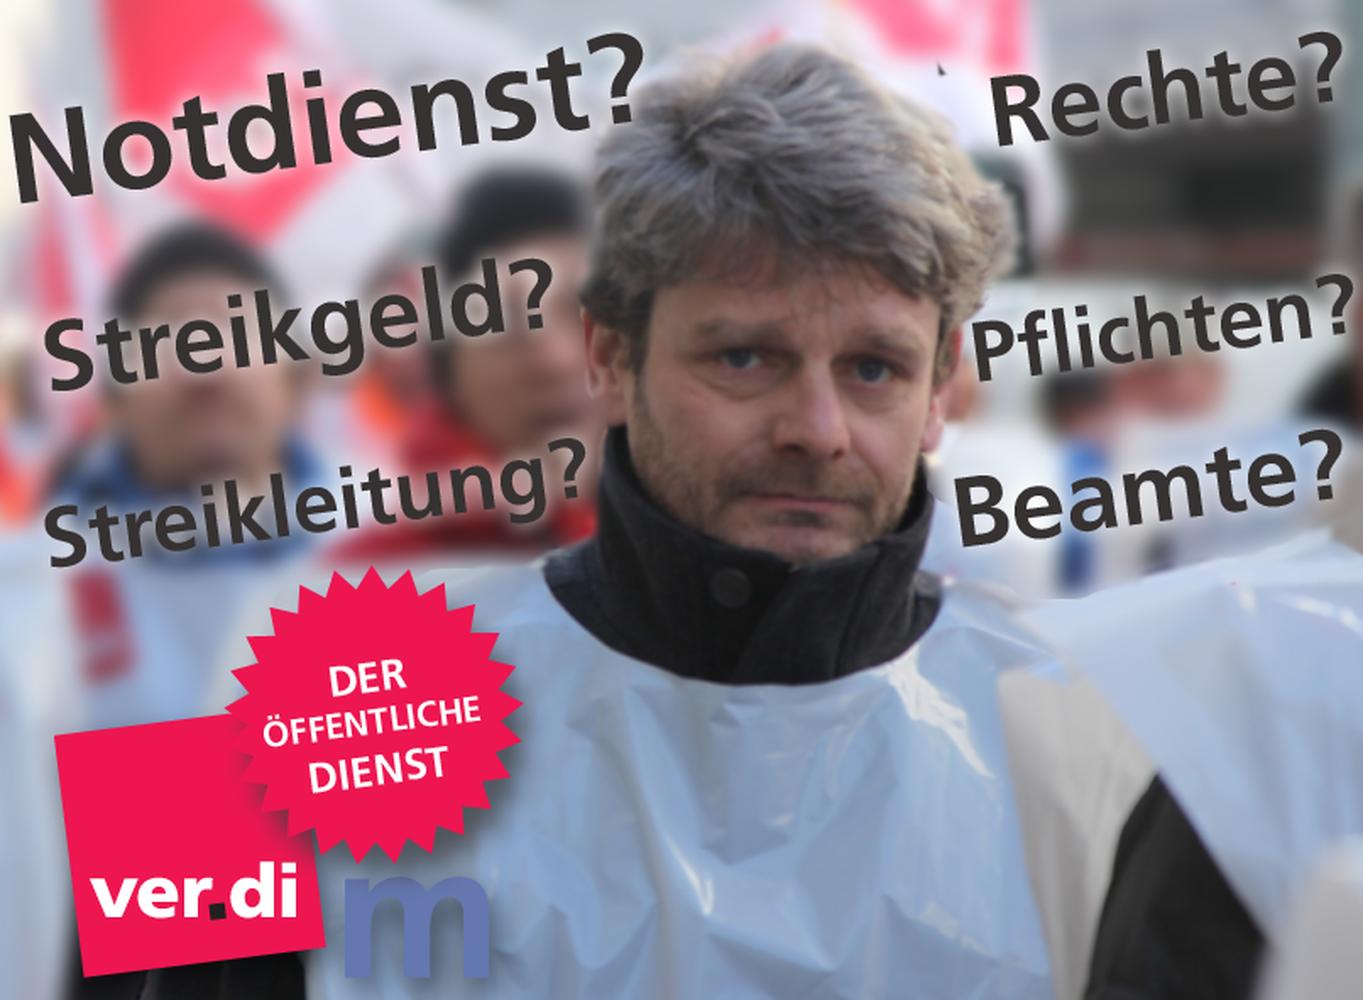 TVÖD/TVV: Schulung Zum Arbeitskampfrecht